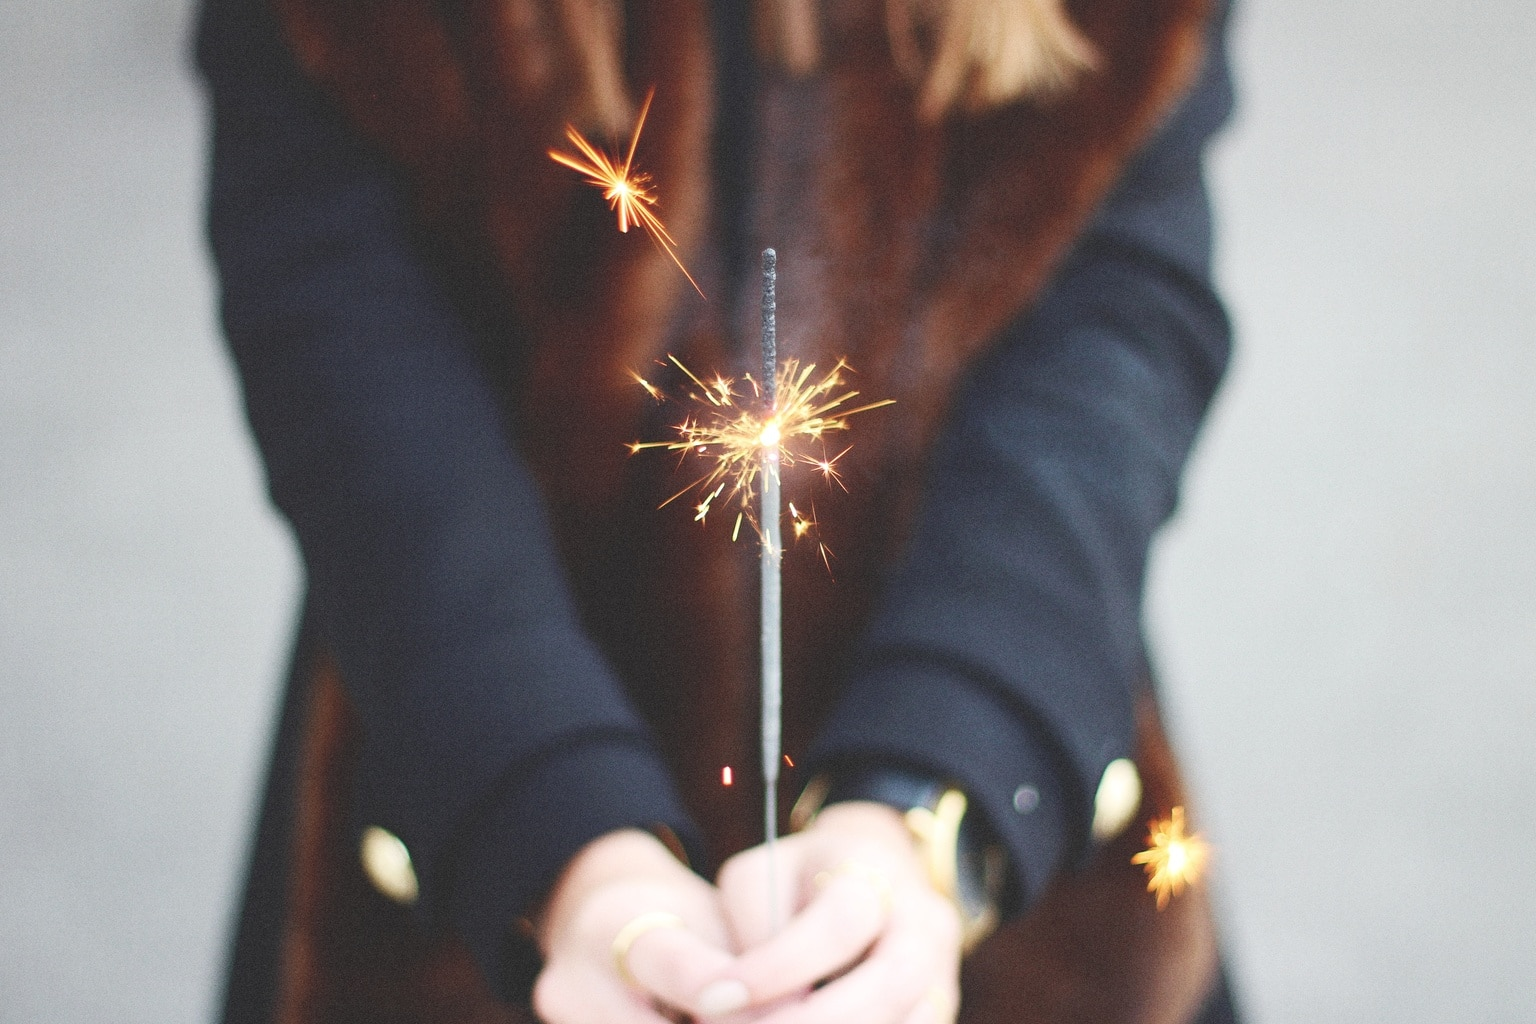 Girl holding a lit sparkler in her hands